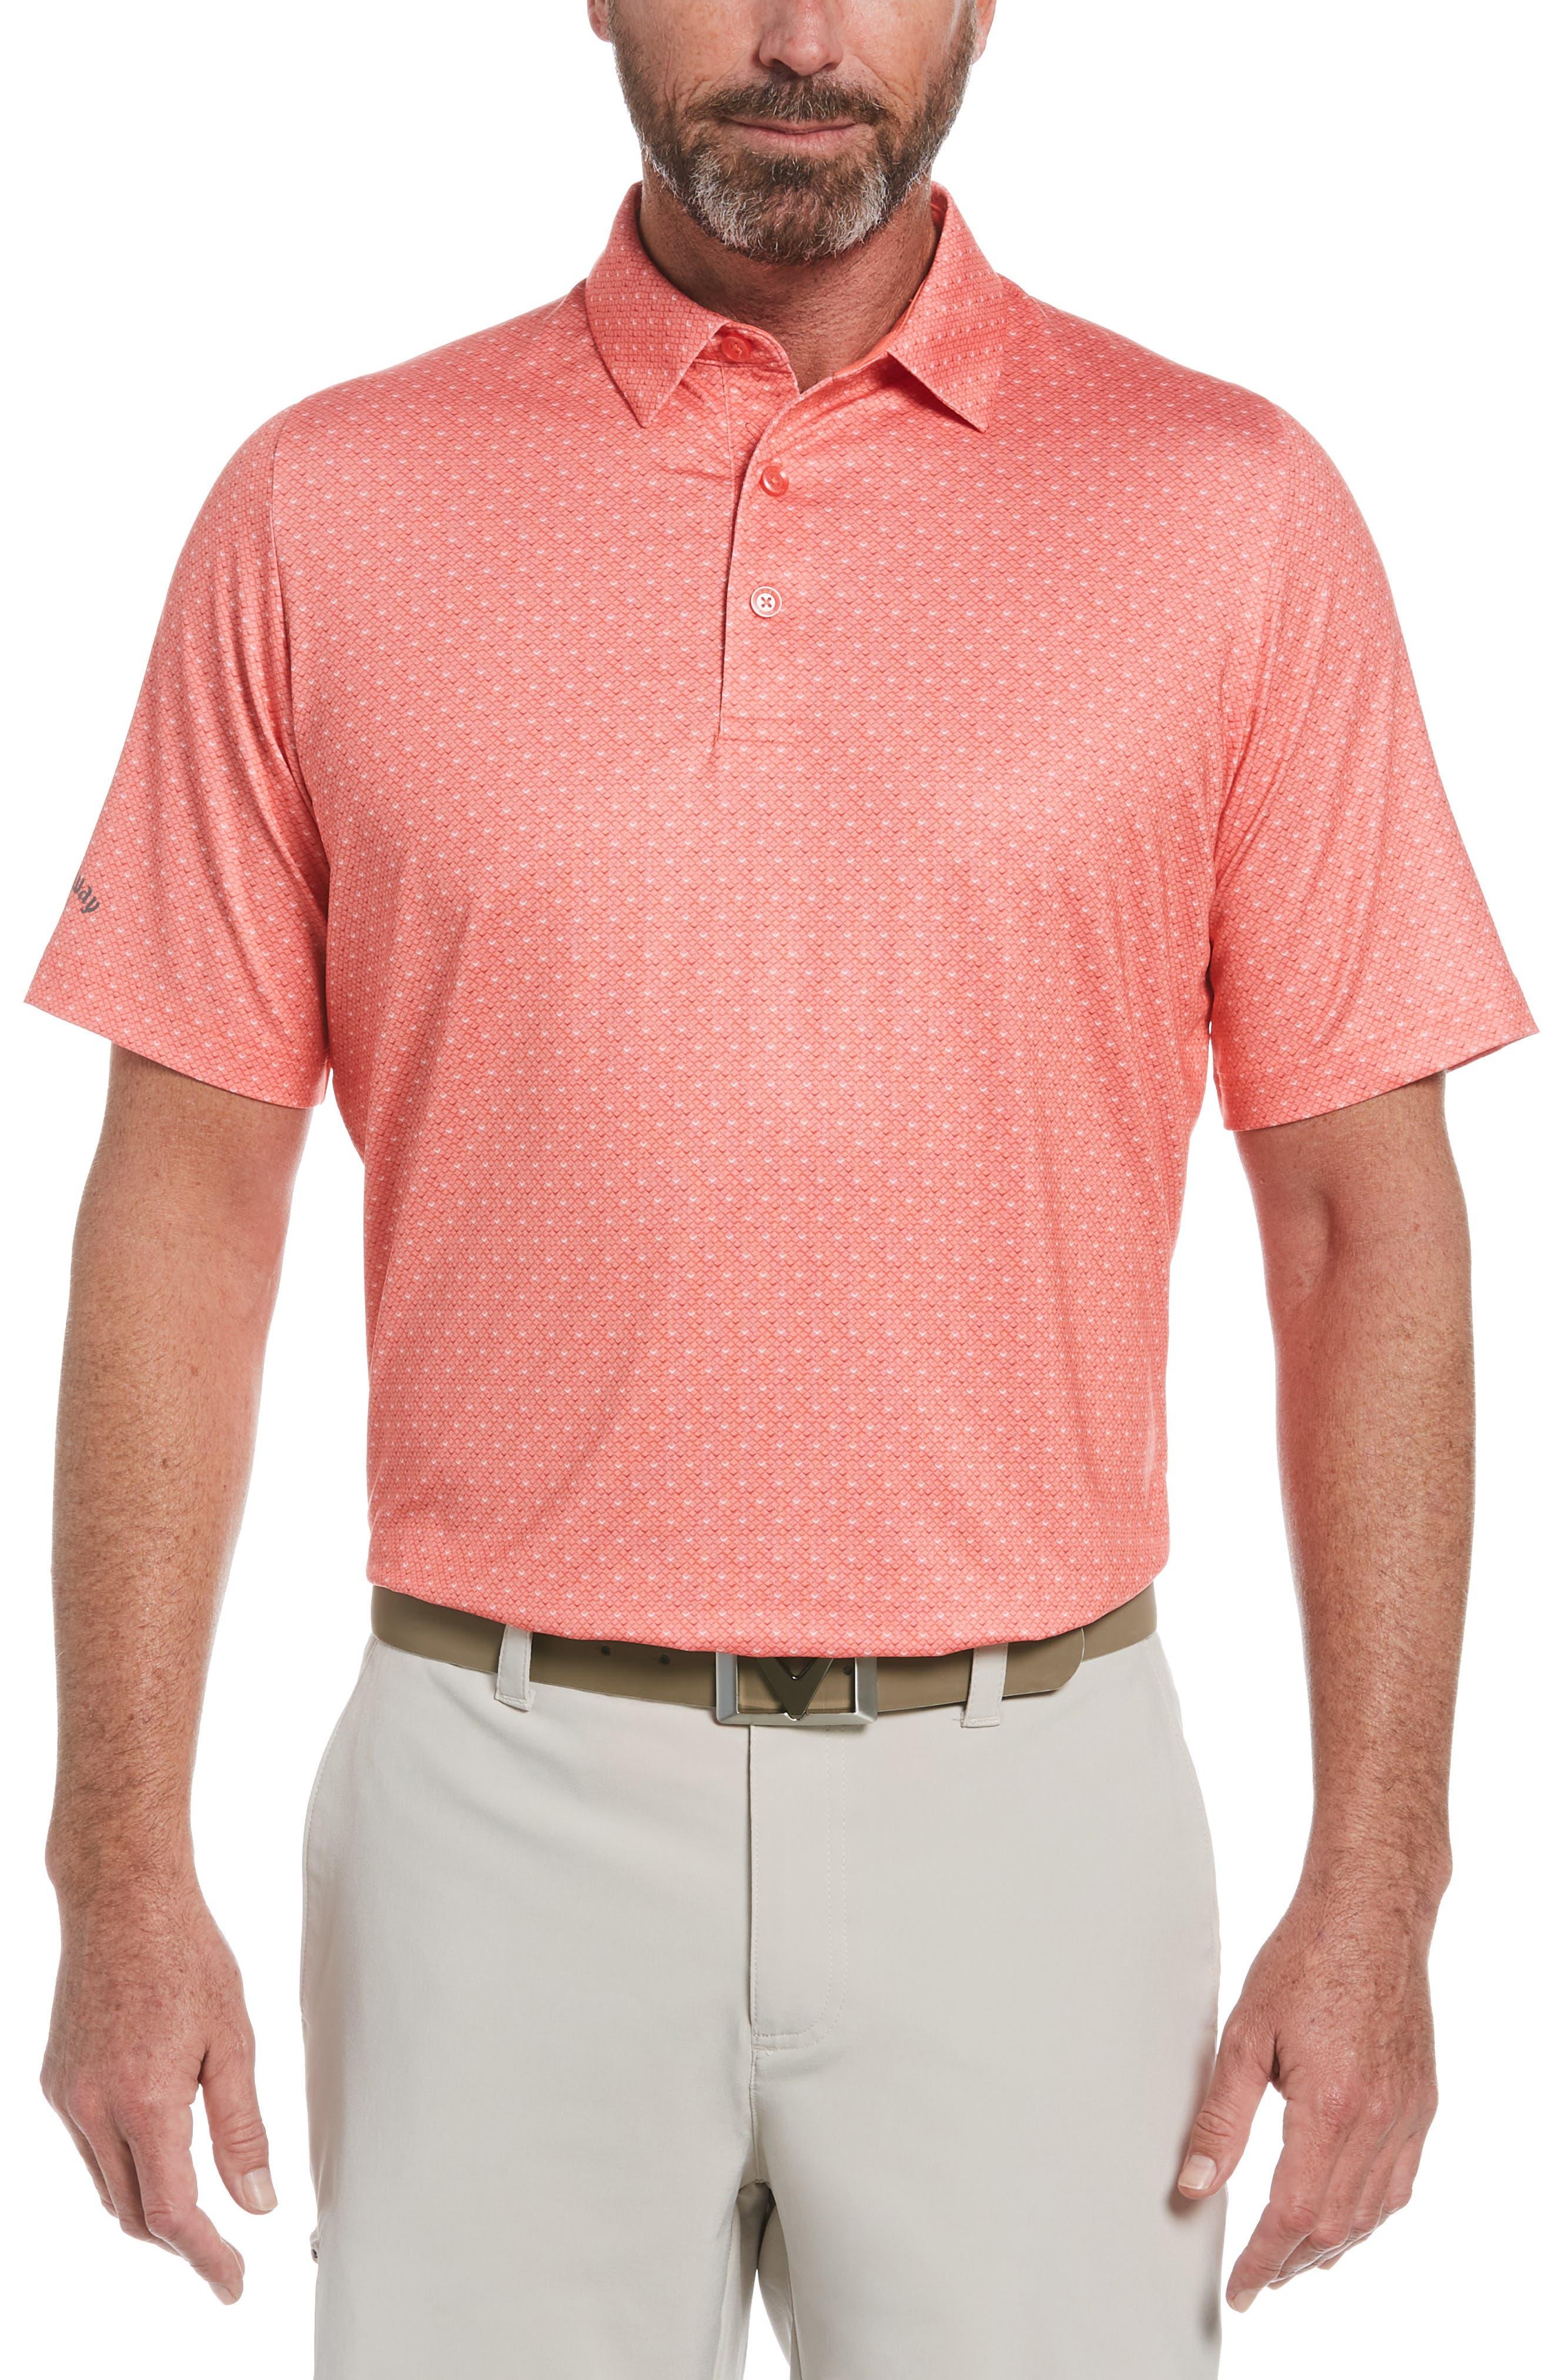 Men's Callaway Golf Swing Tech Golf Polo